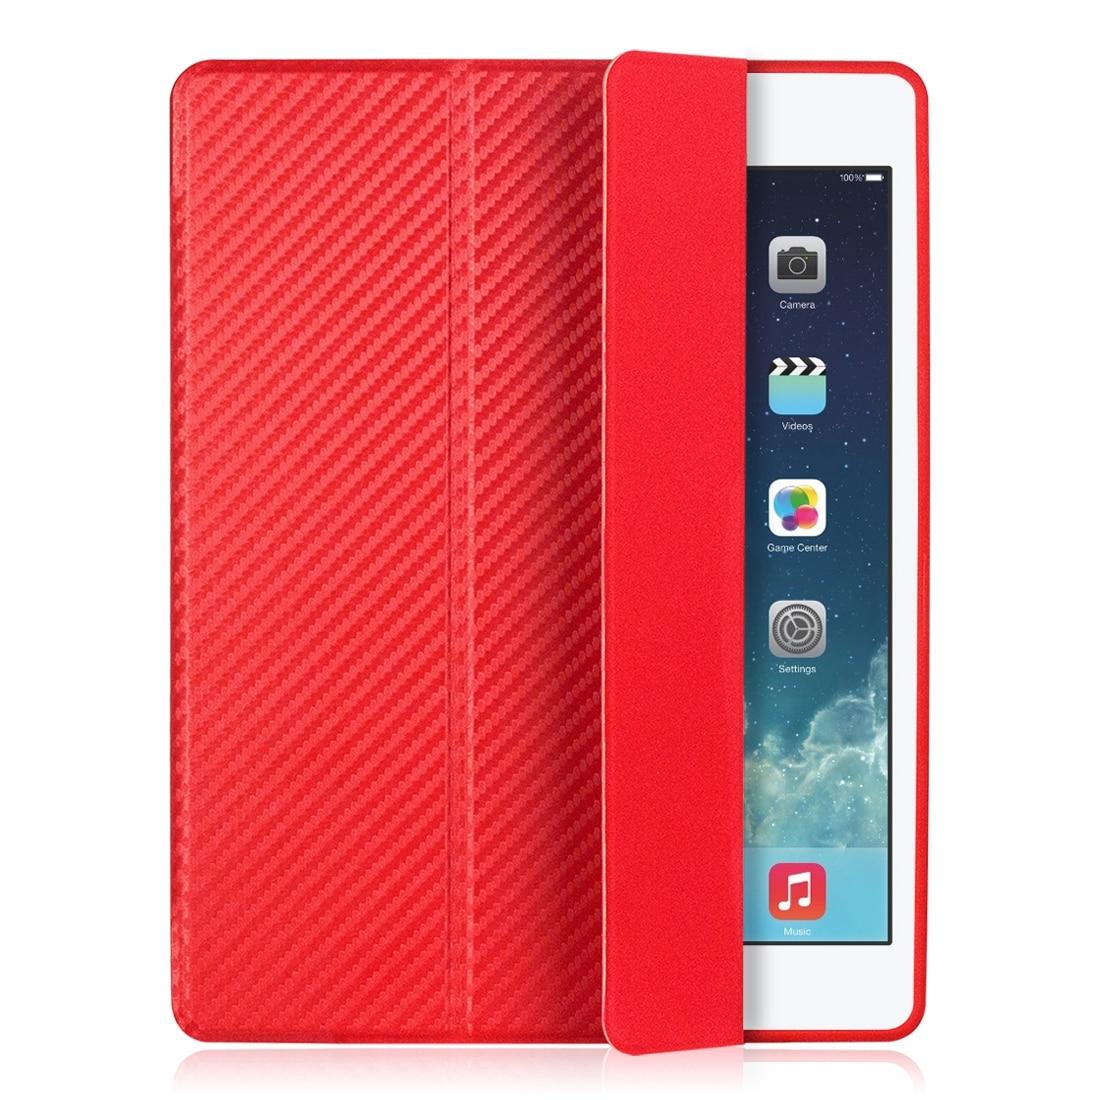 Cover For Ipad Mini 4 Case Silicone Soft Back For Apple Ipad Mini Case 7.9 Inch Carbon Fiber Shockproof Auto Sleep/Wake